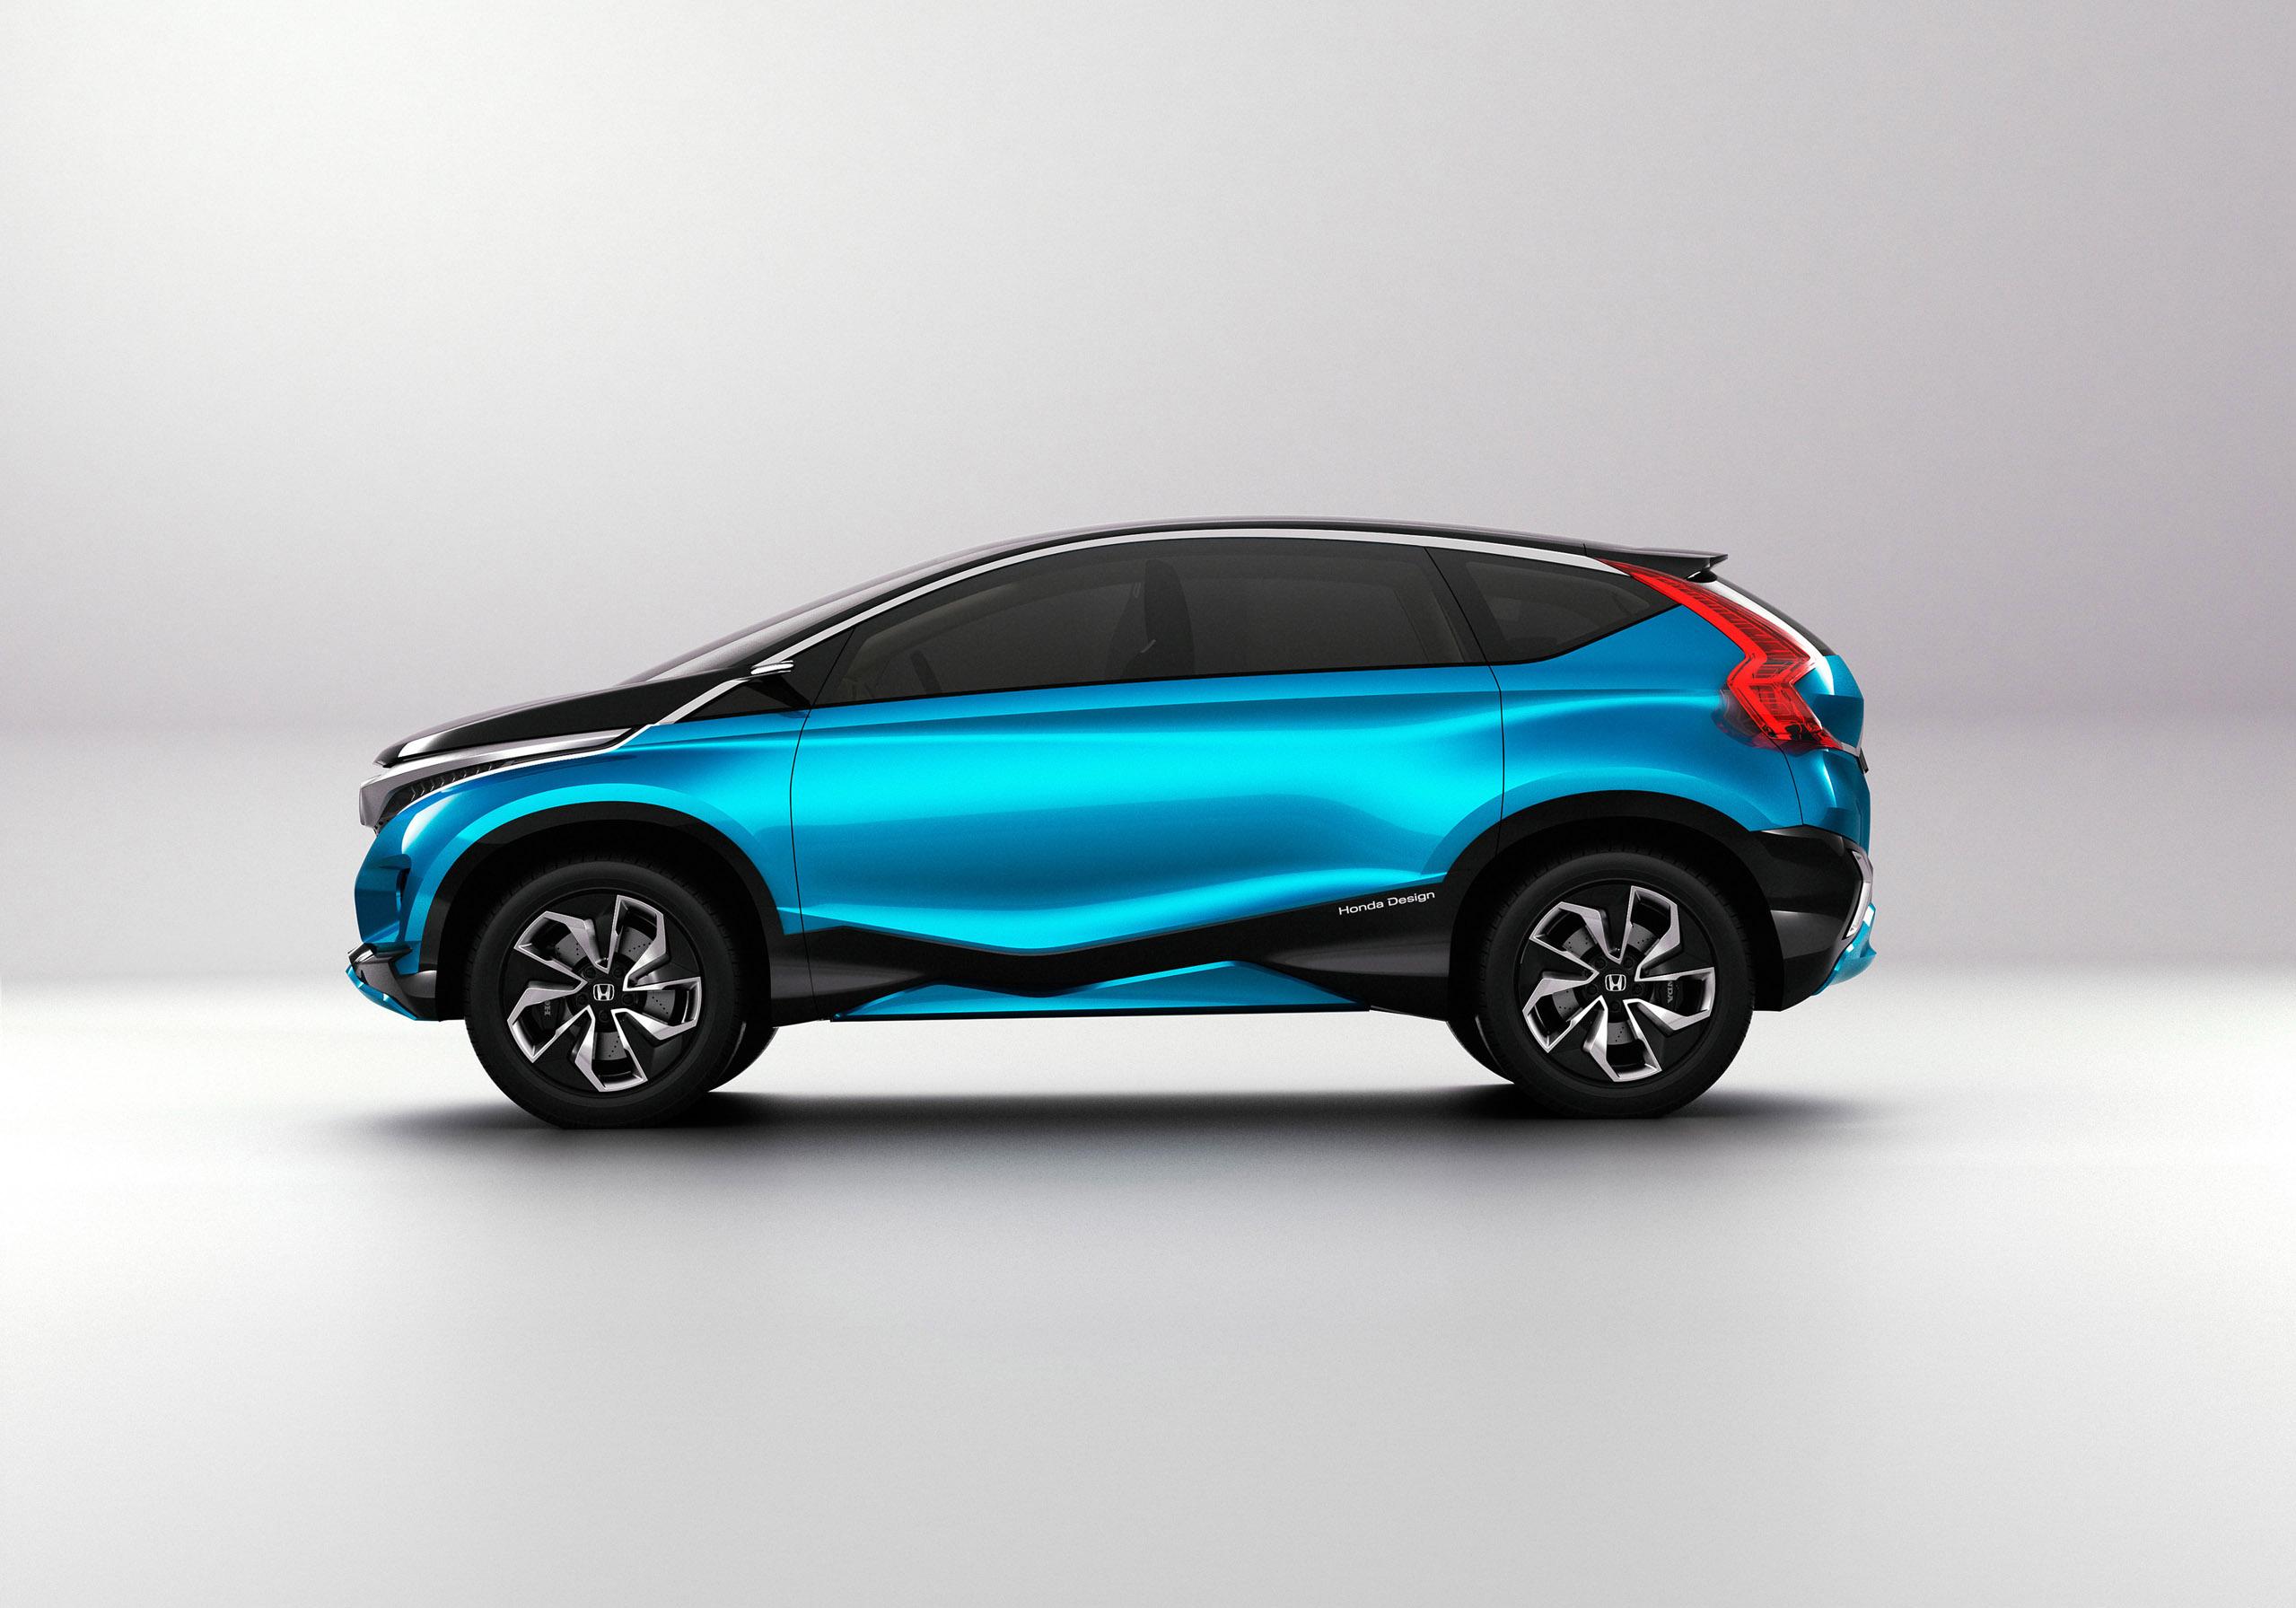 Honda Vision Xs Concept